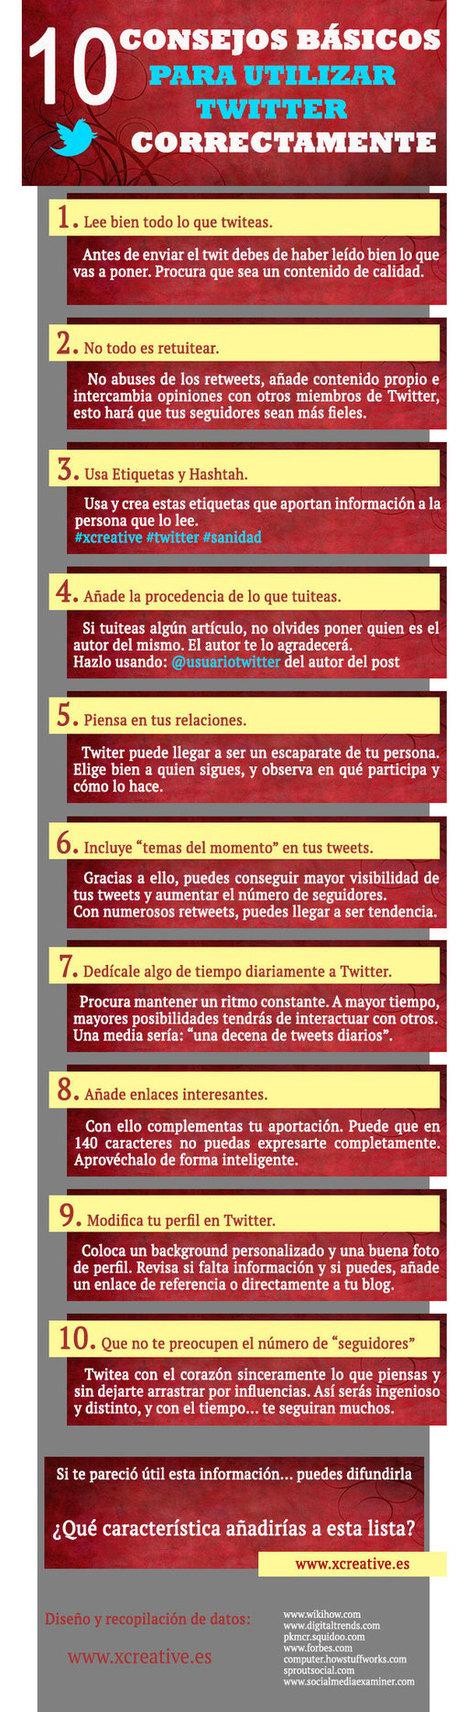 10 consejos para usar Twitter correctamente infografia-infographic | Infograf | Scoop.it